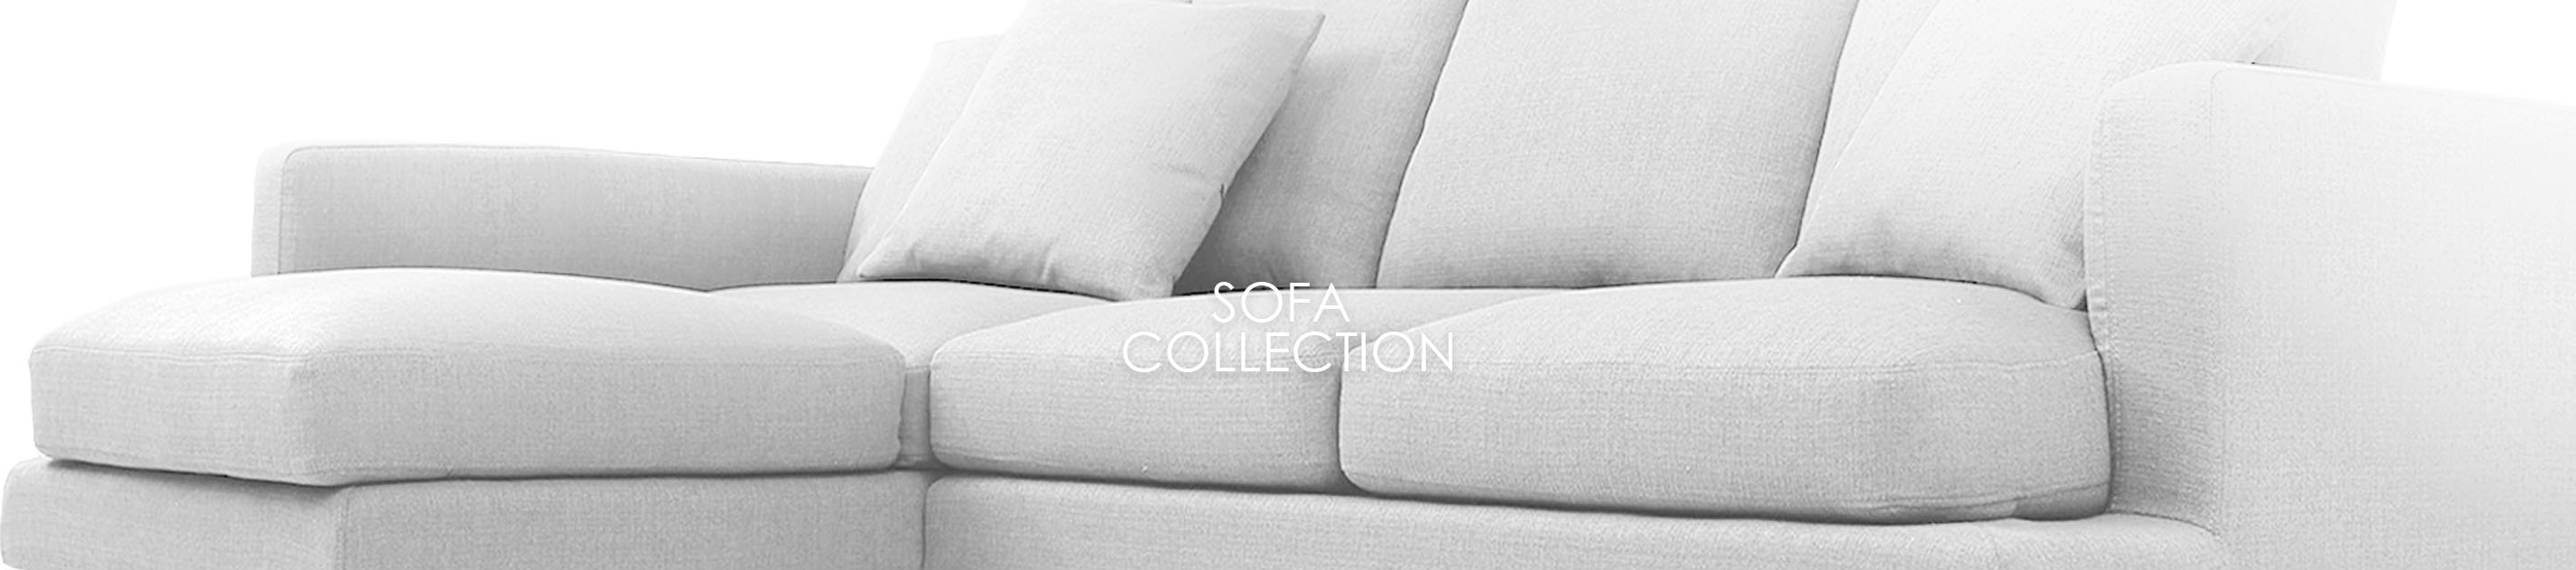 Astonishing Sofas Hong Kong Buy Sofa Online At Stockroom Furniture Download Free Architecture Designs Sospemadebymaigaardcom